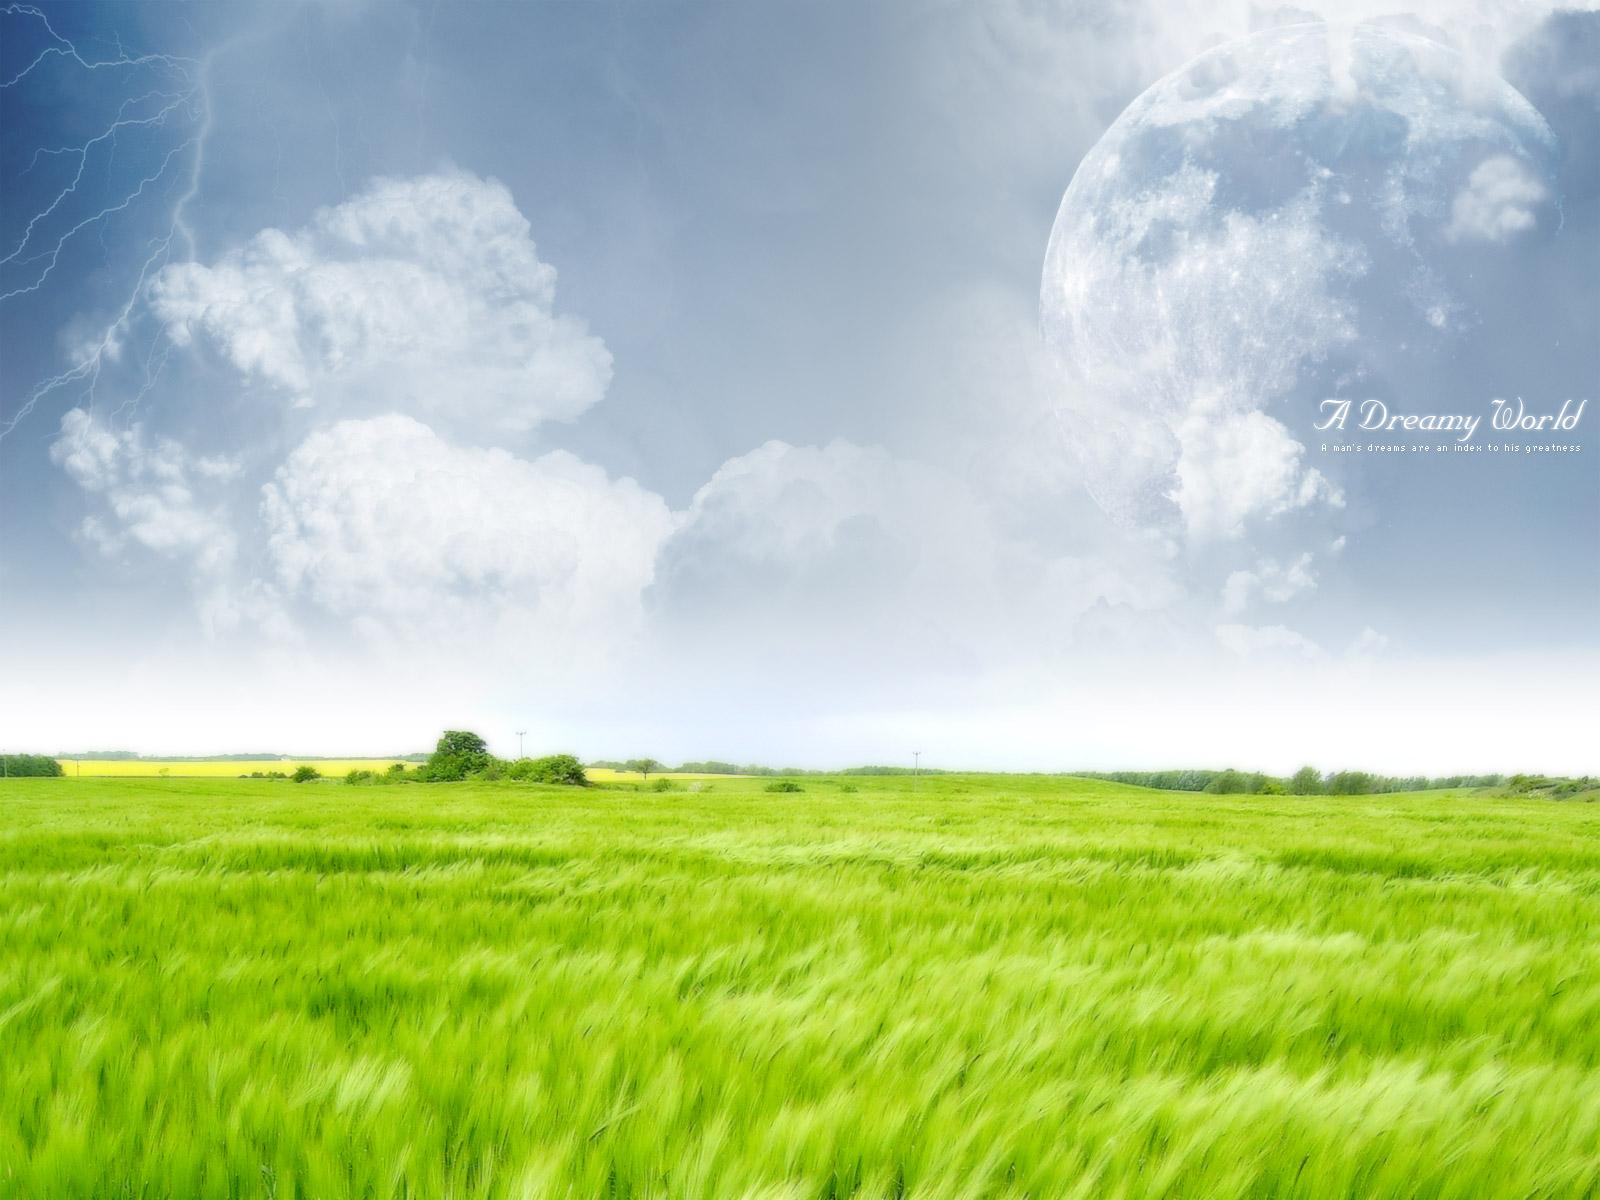 Green Farm Dreamy World Wallpapers HD Wallpapers 1600x1200